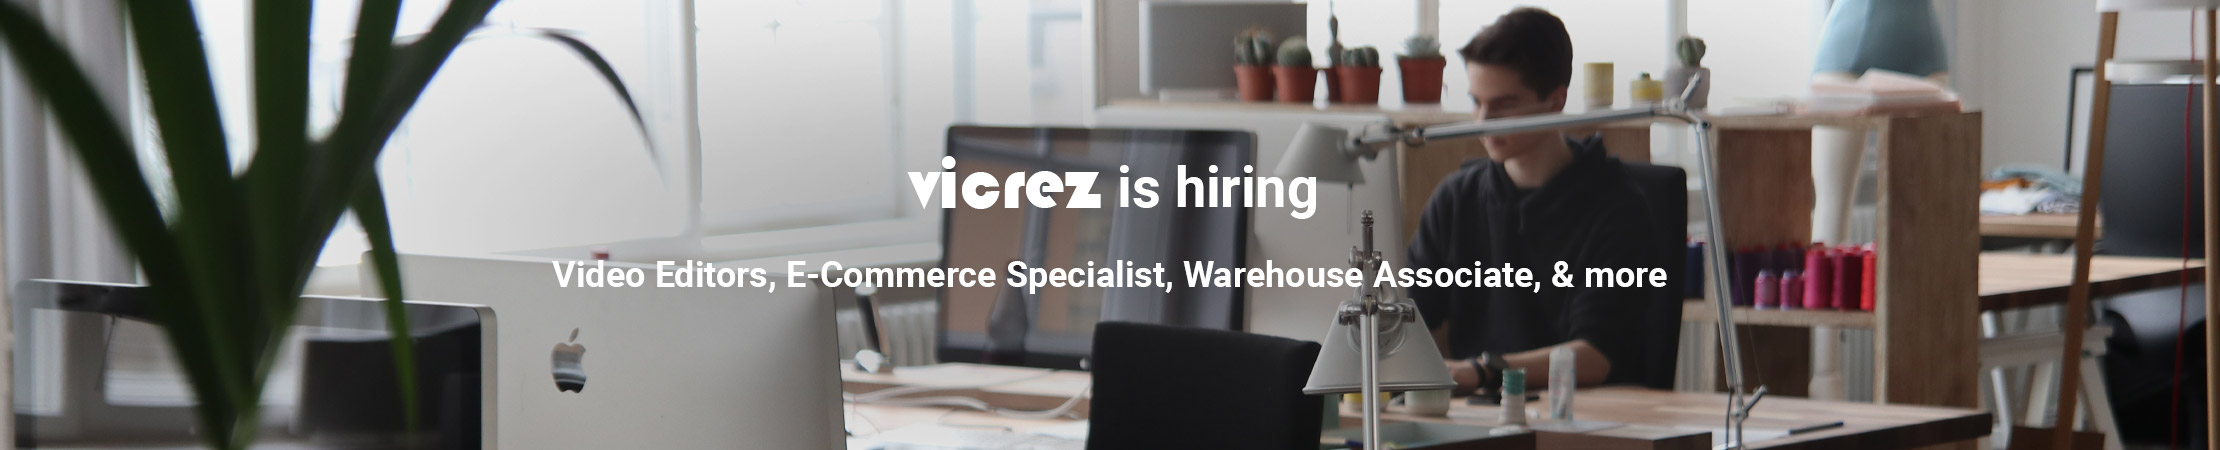 Vicrez.com is Hiring